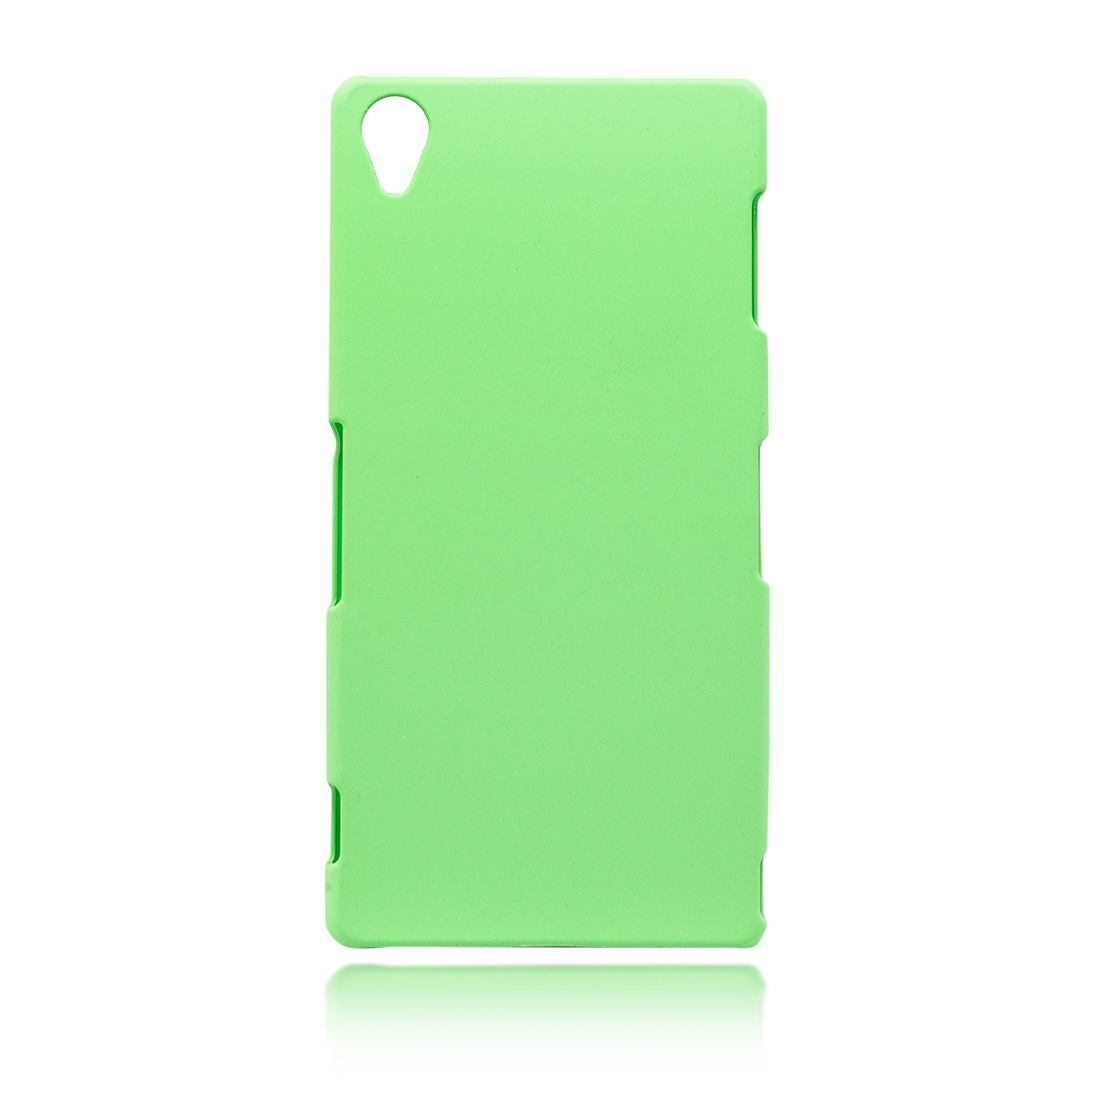 Пластиковая зелёная накладка для Xperia Z3 в Sony Centre